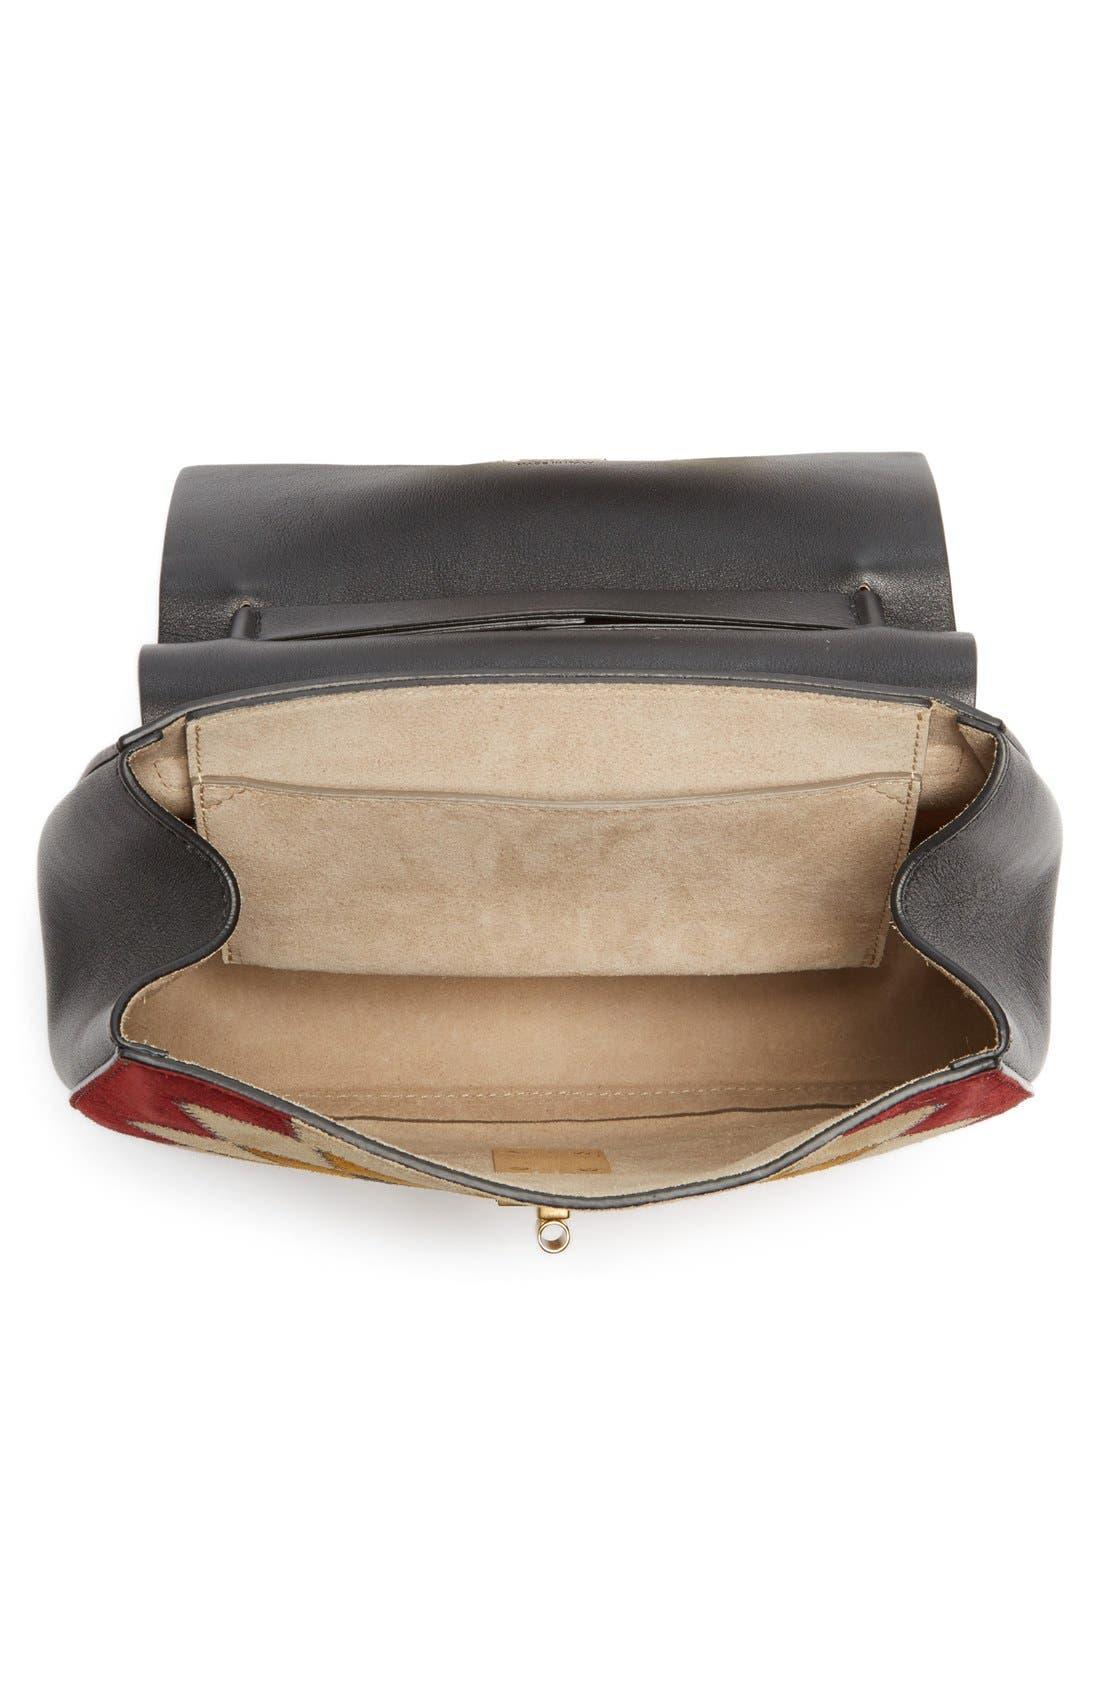 Alternate Image 4  - Chloé 'Small Drew' Wonder Woman Patchwork Suede & Leather Shoulder Bag